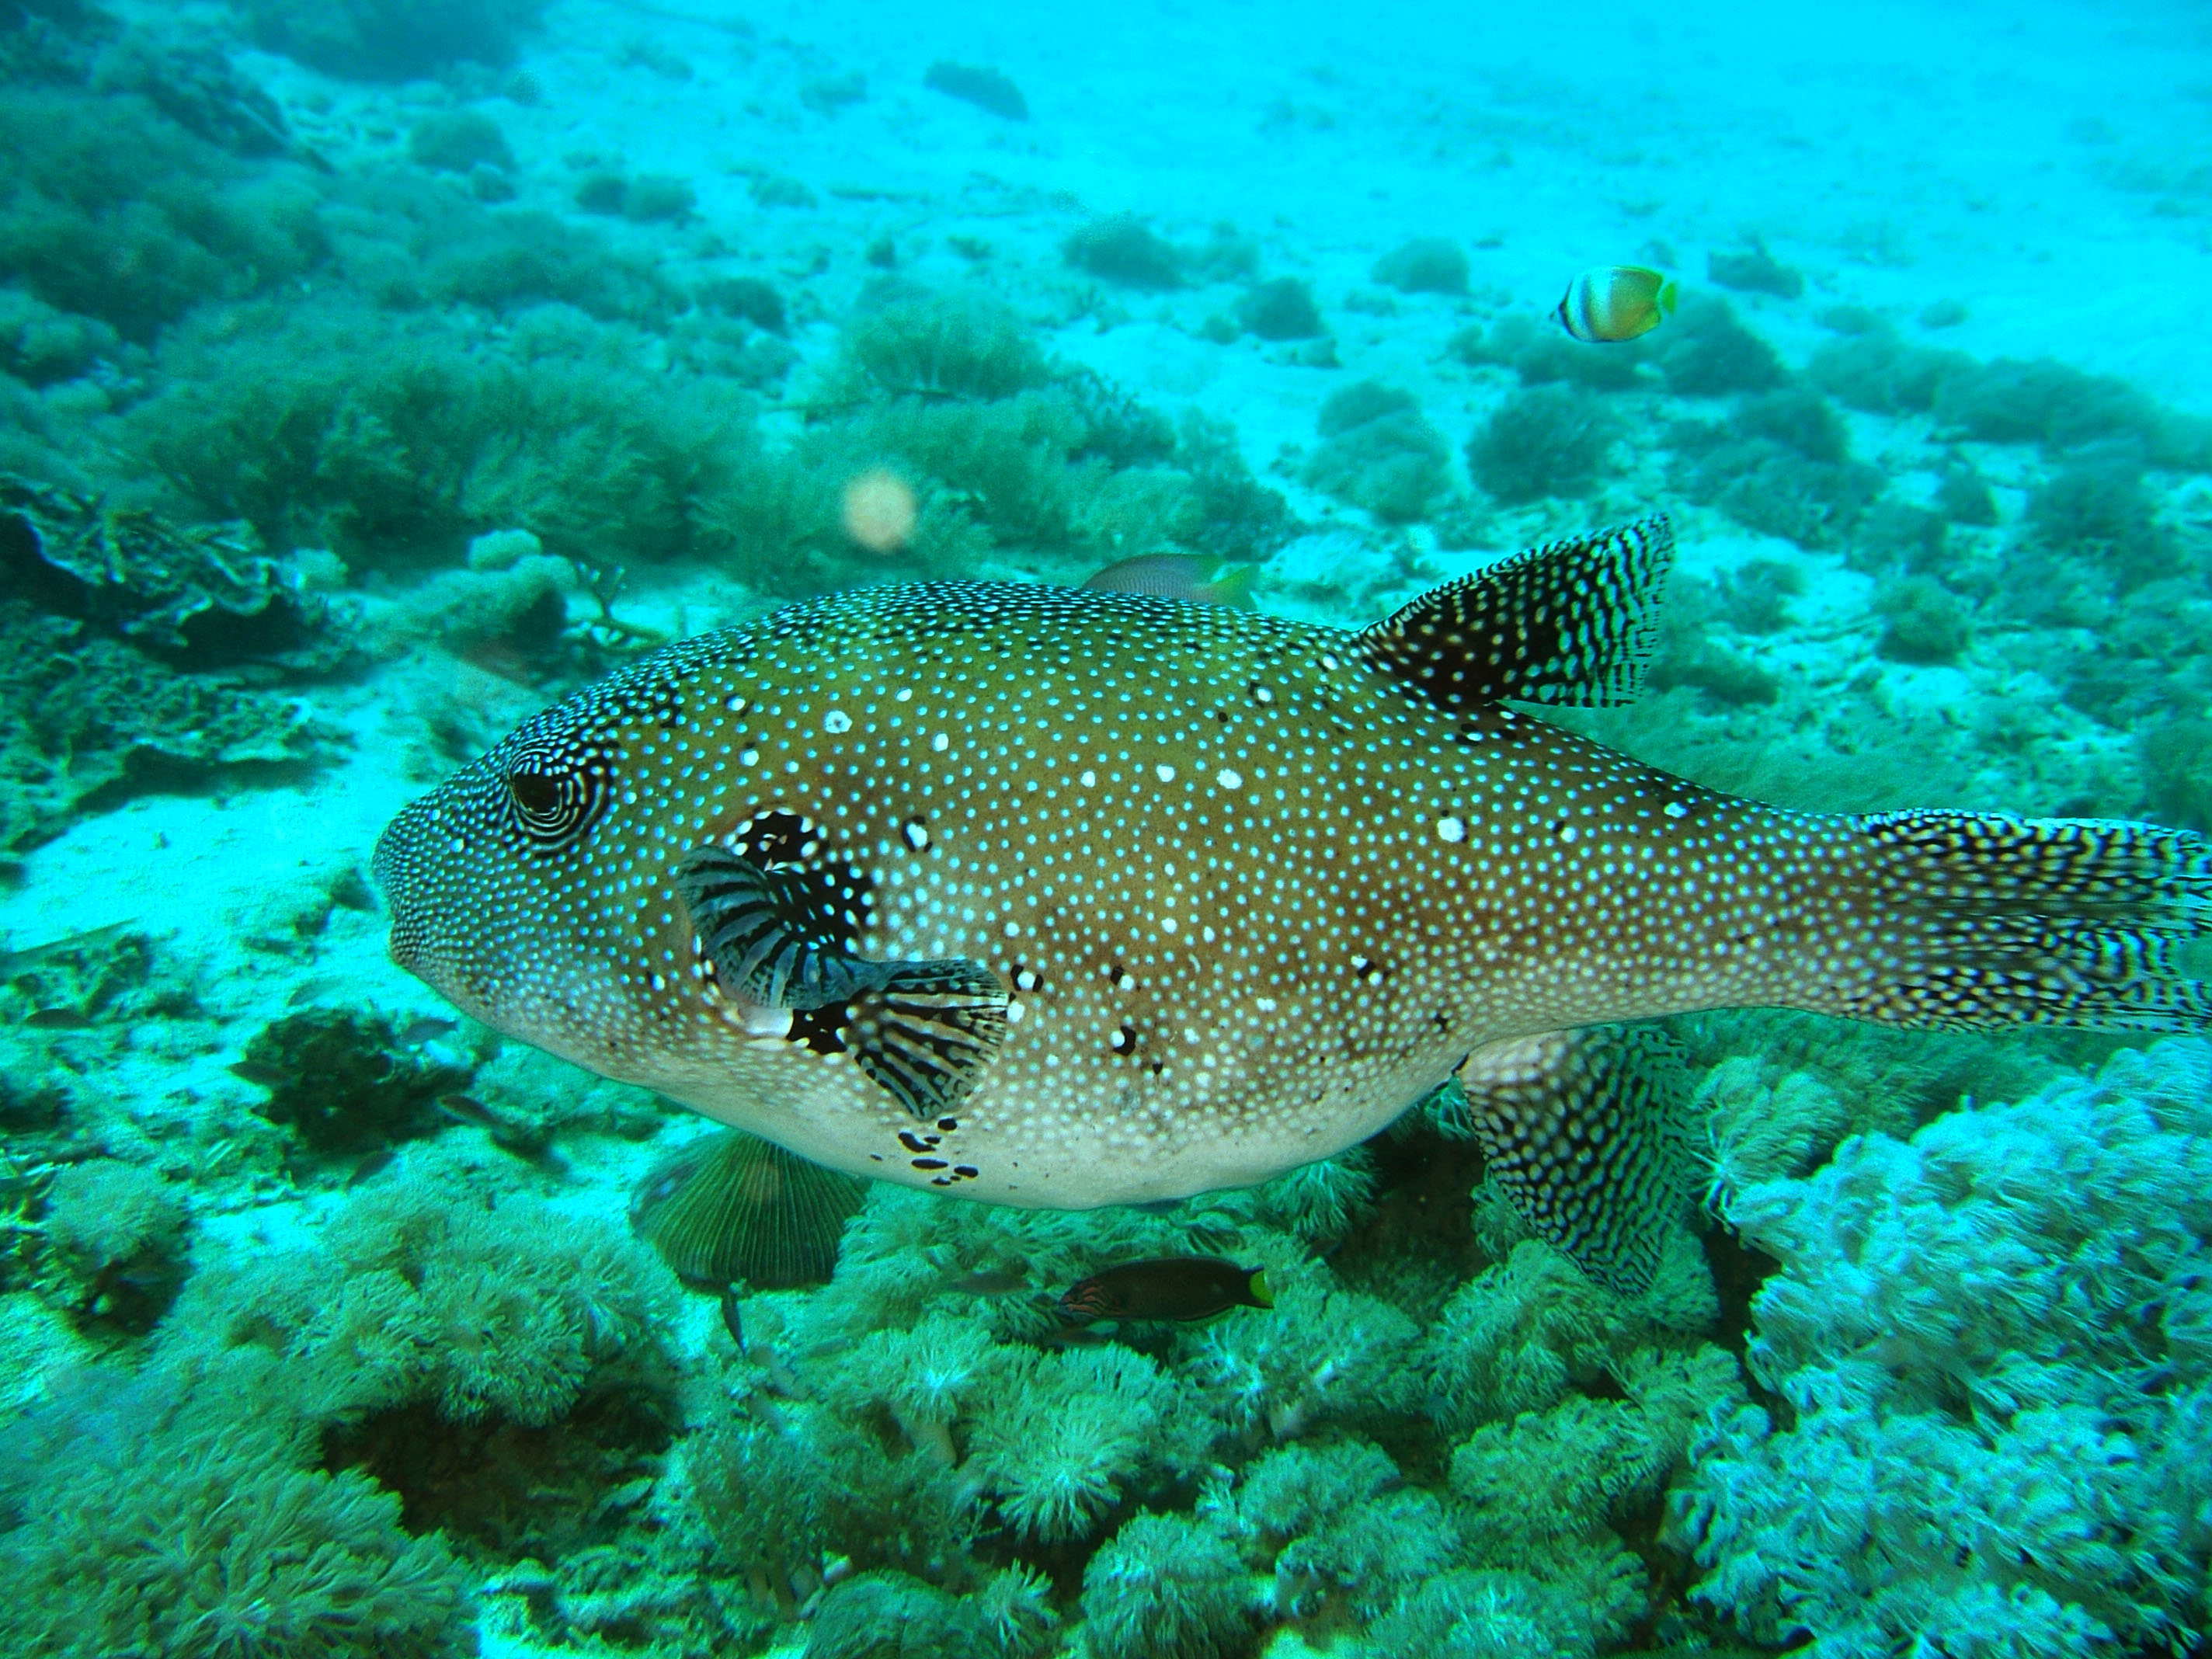 Dive 8 Philippines Mindoro Sabang Elma Jane wreck Oct 2005 35